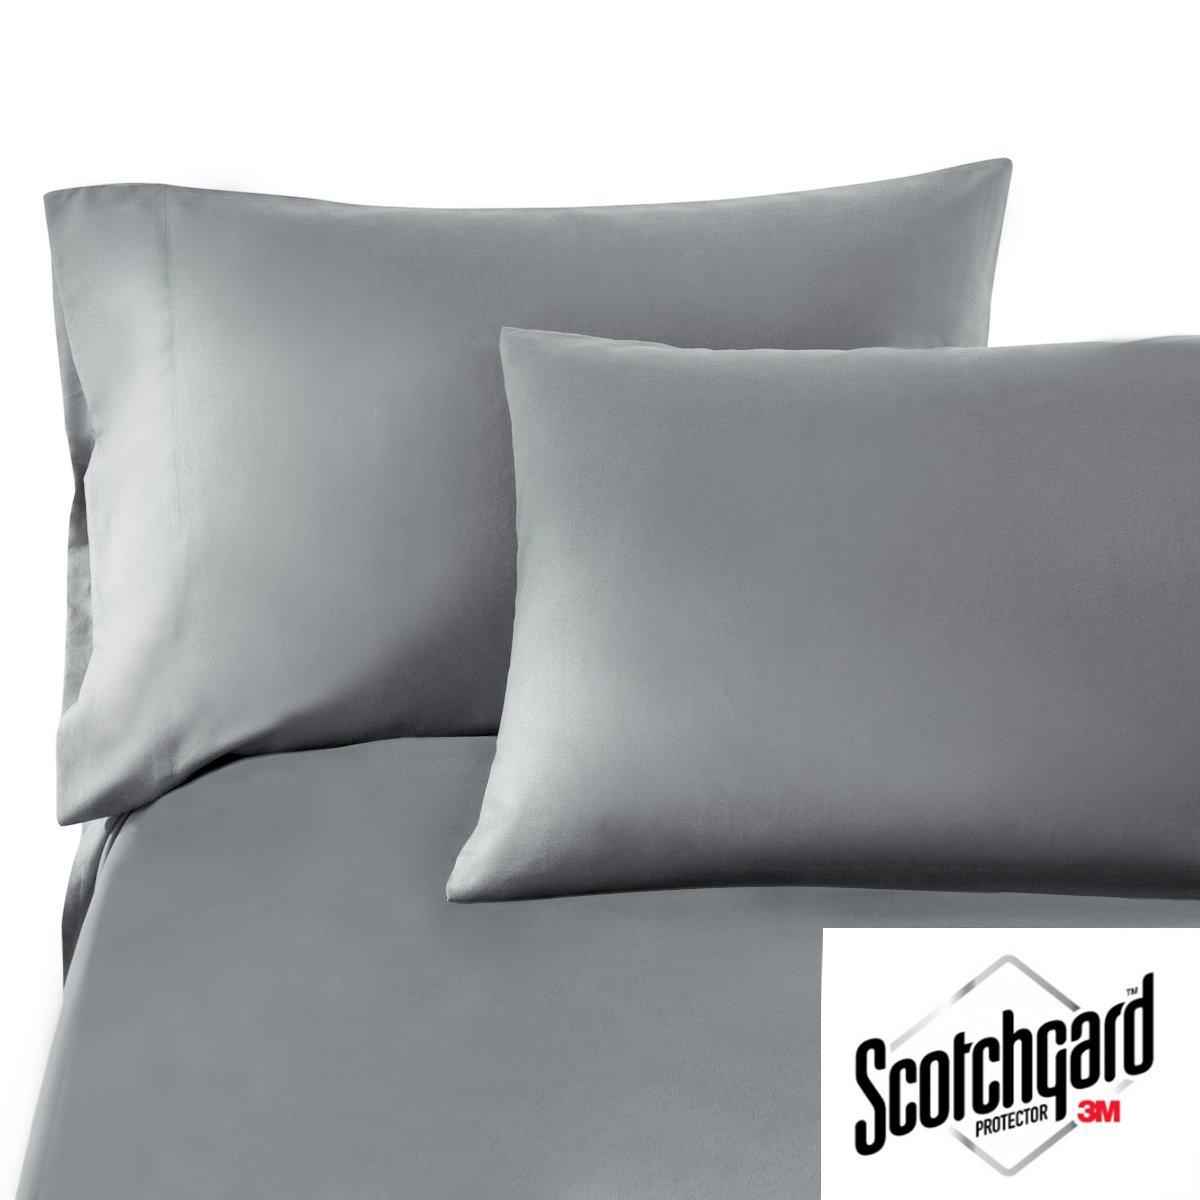 HONEYMOON HOME FASHIONS King Grey 3M Scotchgard Bed Sheet Set